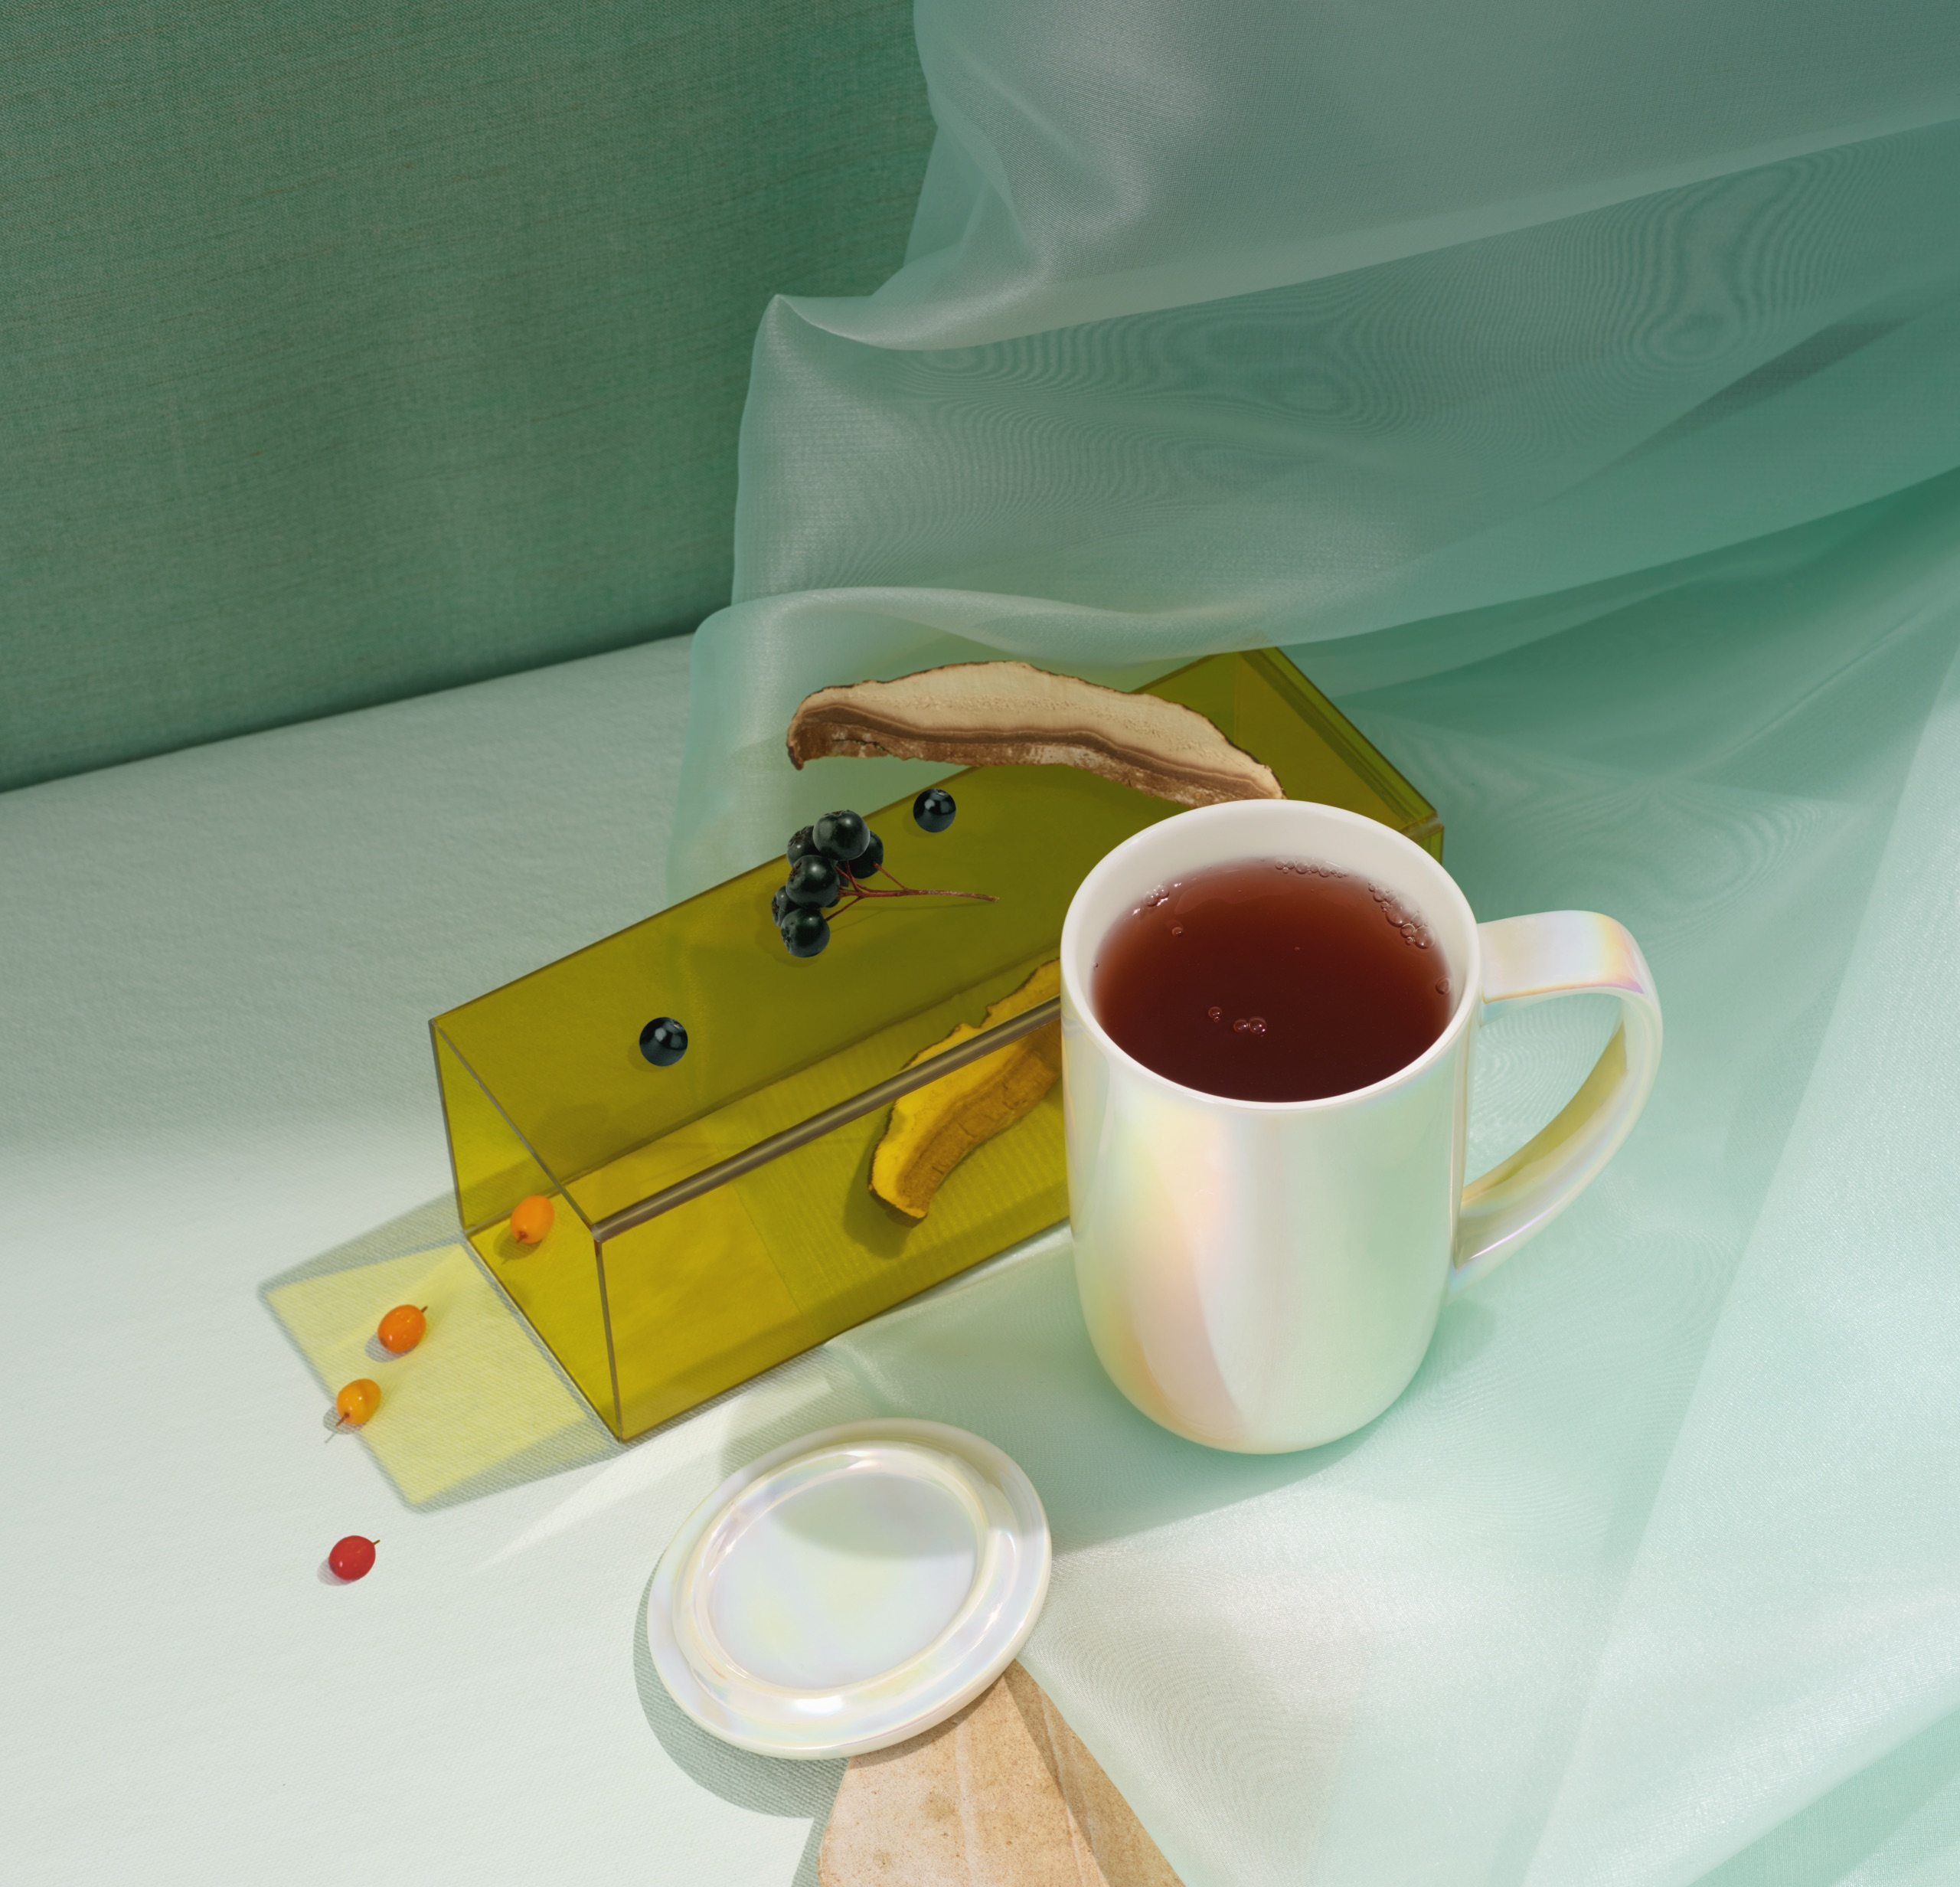 Nordic Mug filled with Reishi Recharge tea next to its raw ingredients.